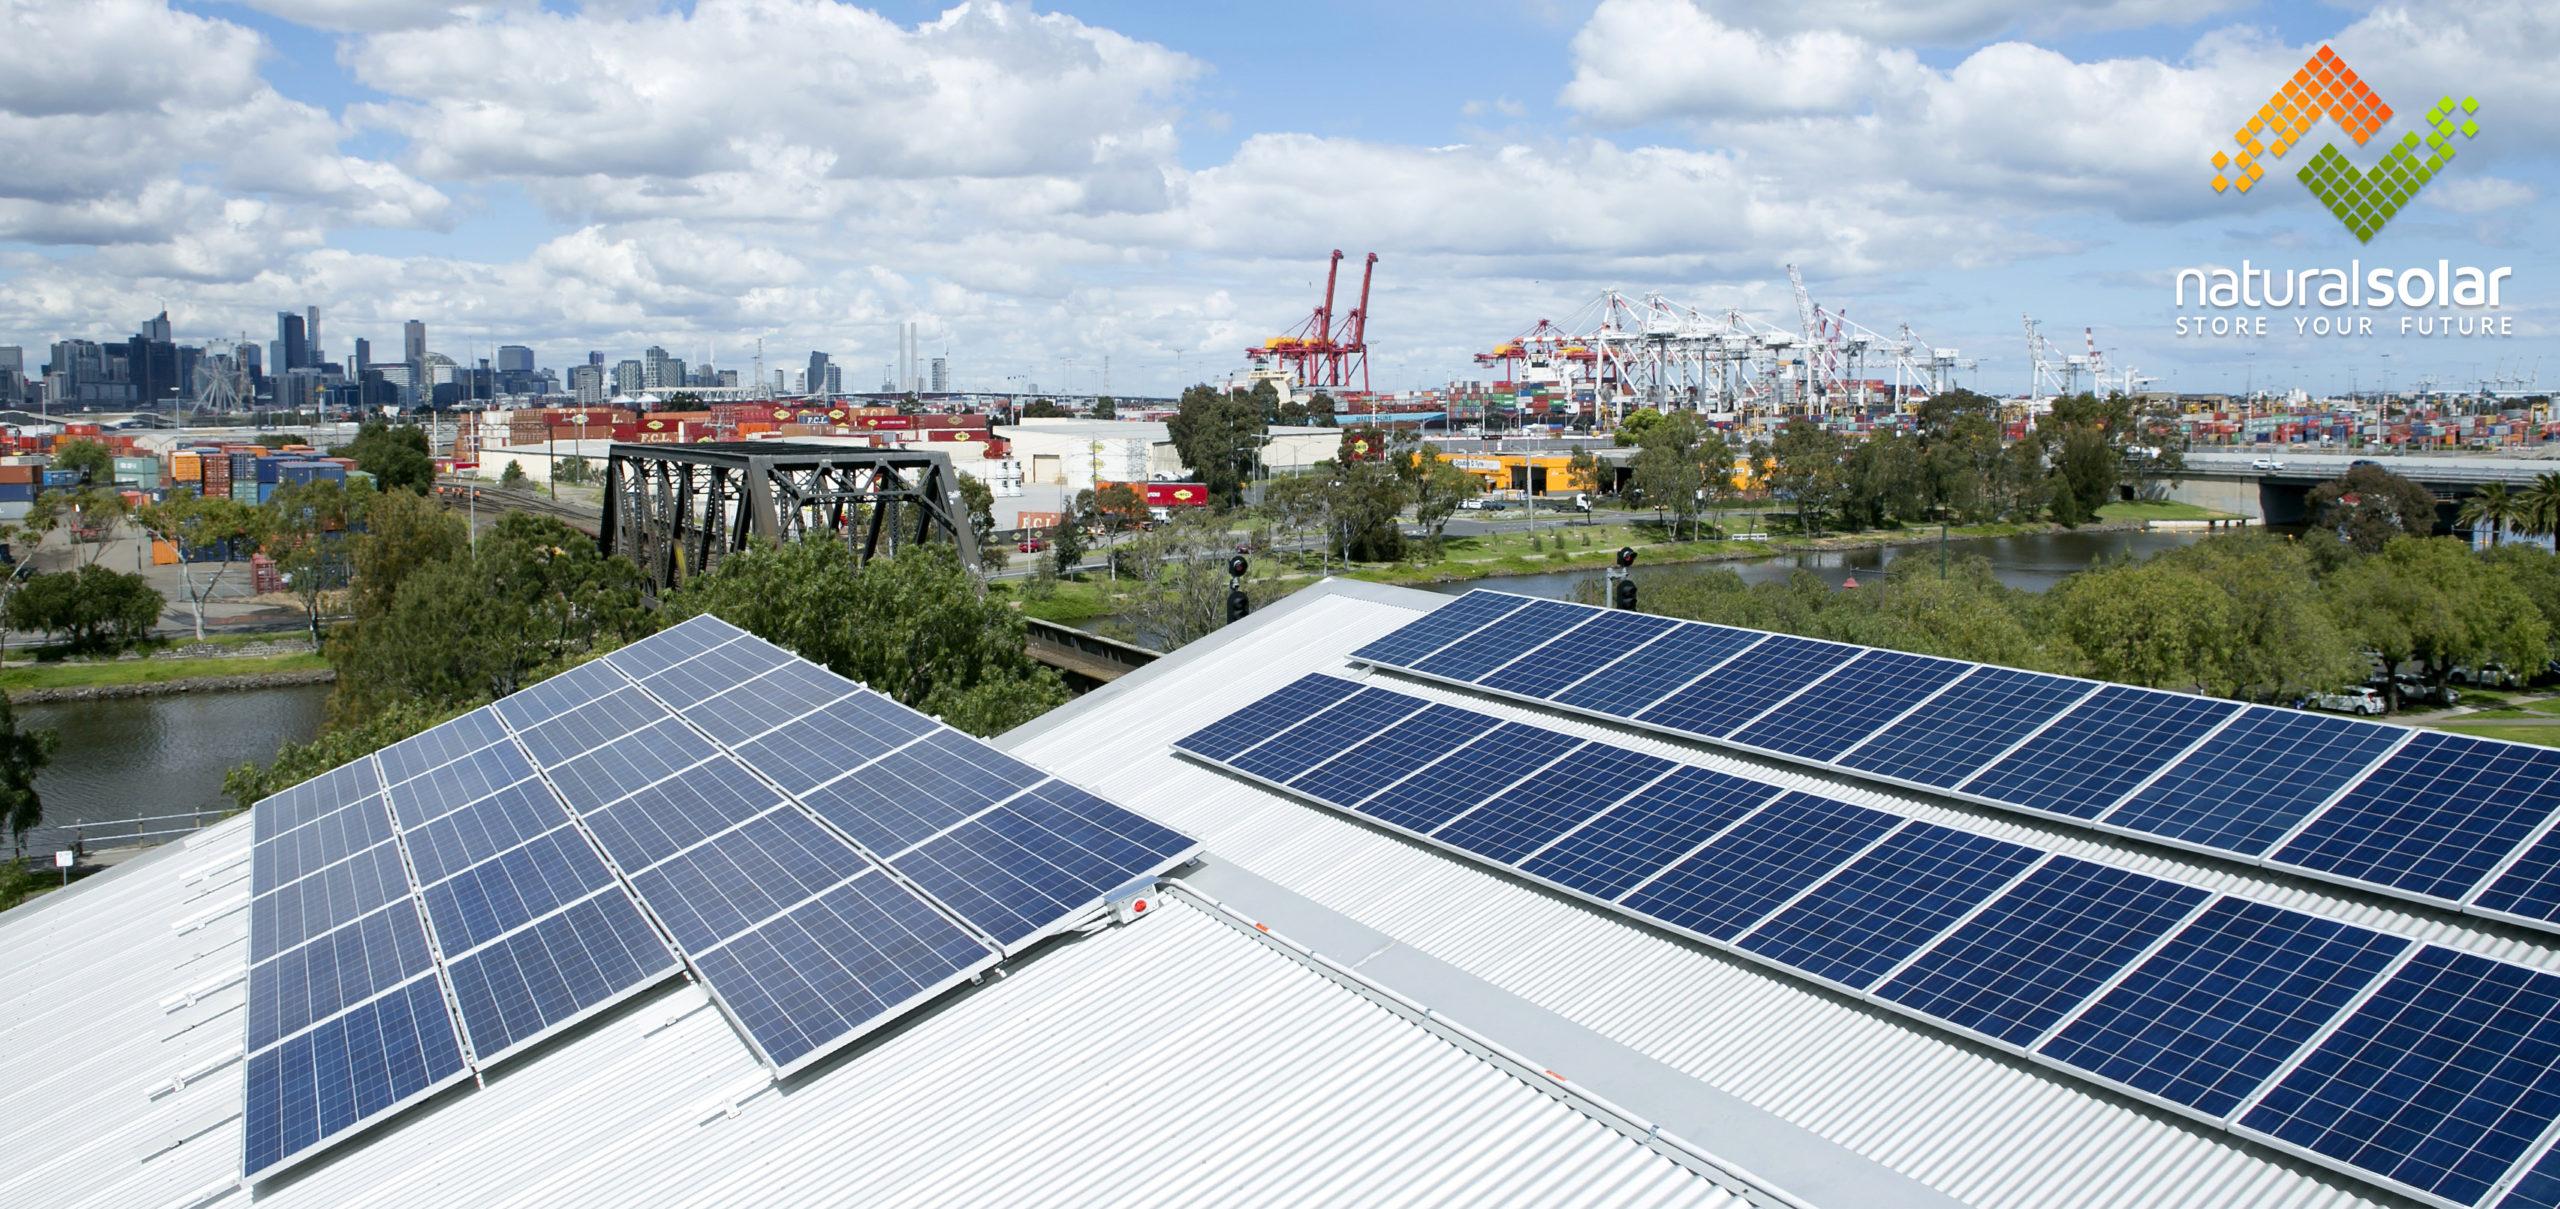 footscray community arts centre - commercial solar by Natural Solar